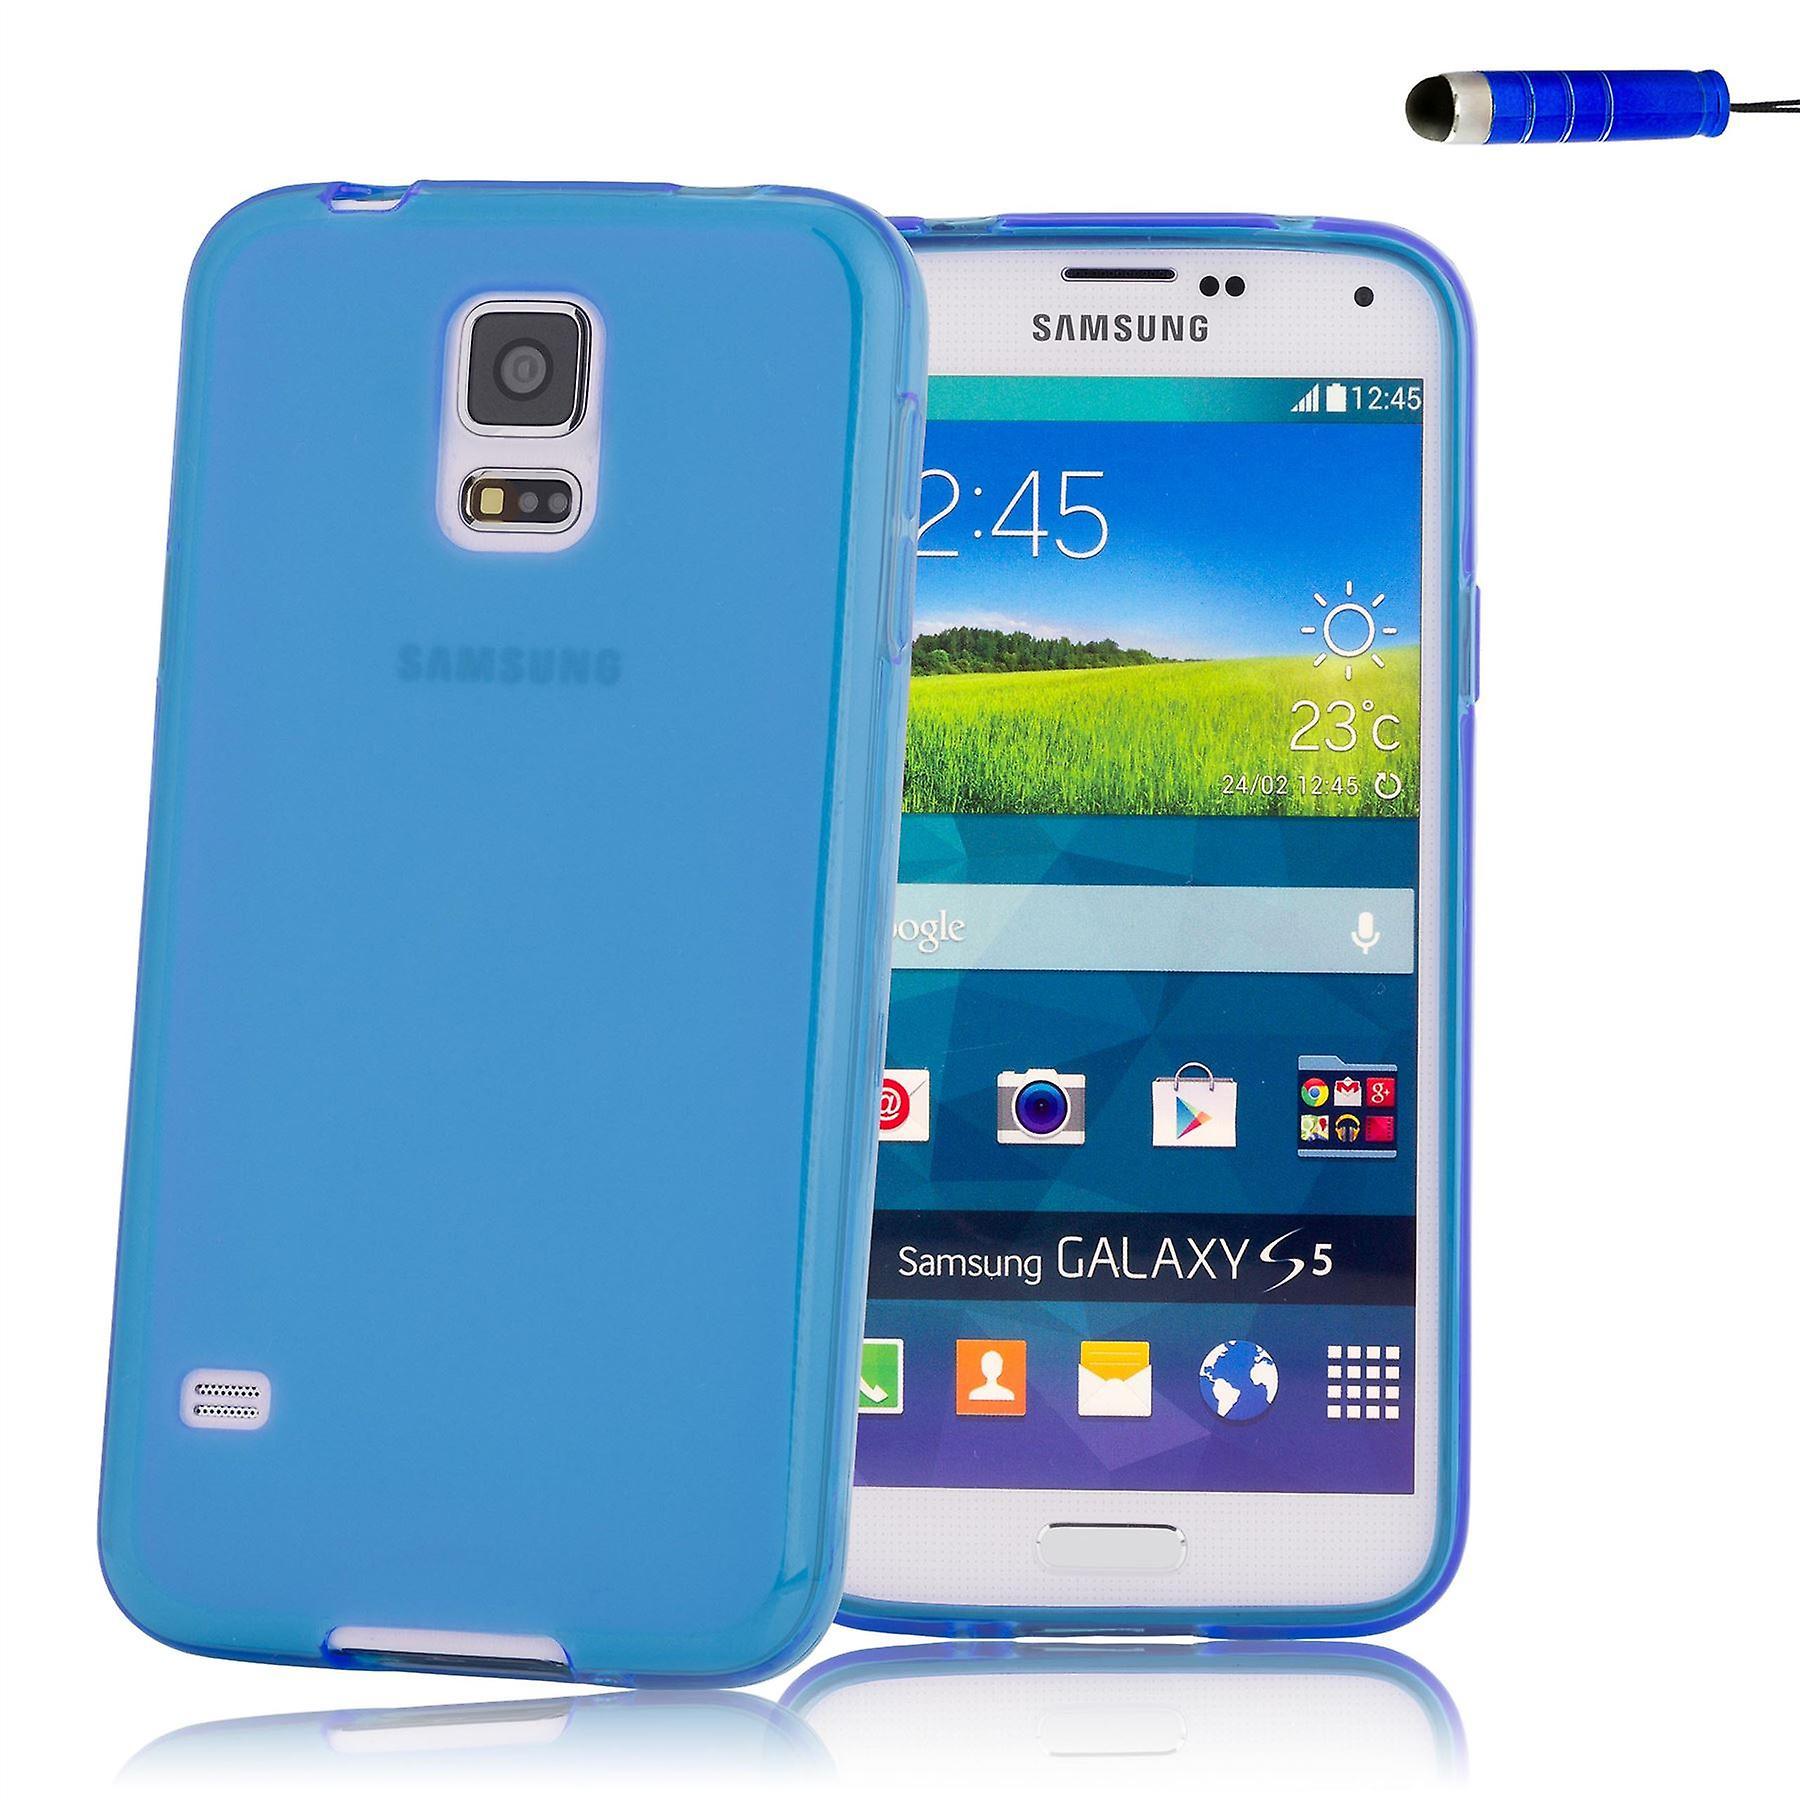 Crystal Gel case cover for Samsung Galaxy S5 Mini (SM-G800) - Deep Blue